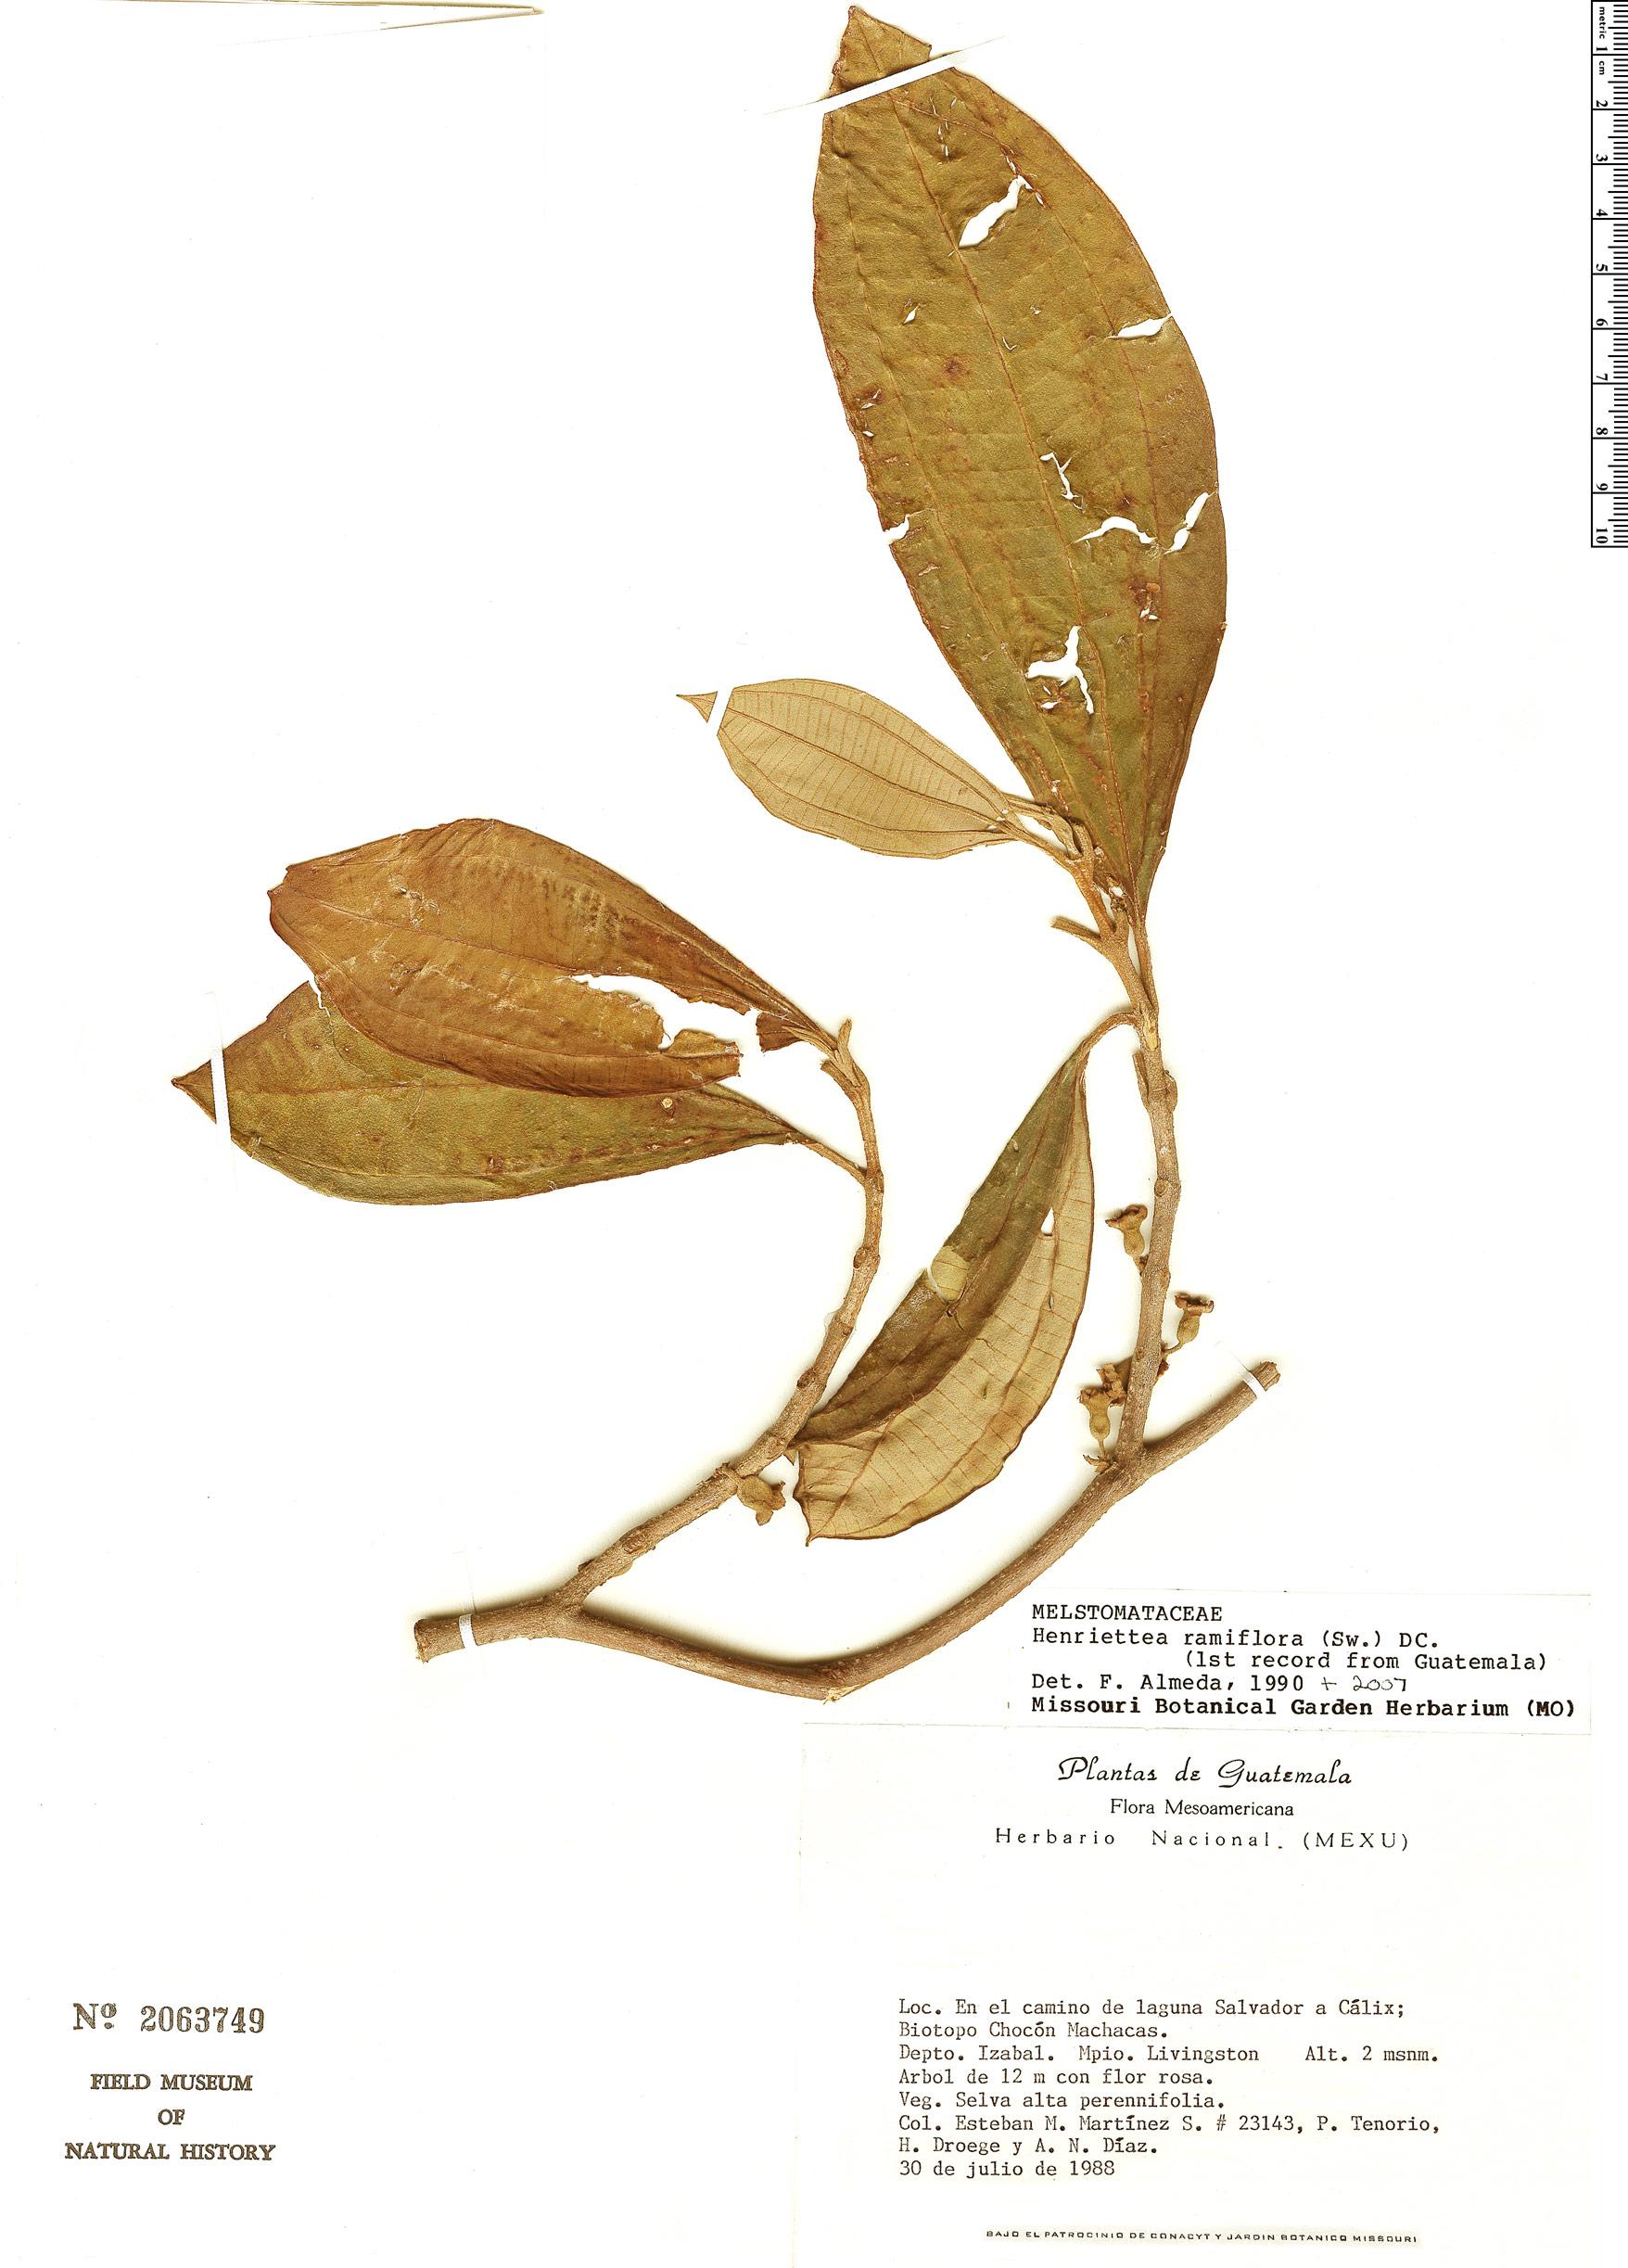 Specimen: Henriettea ramiflora